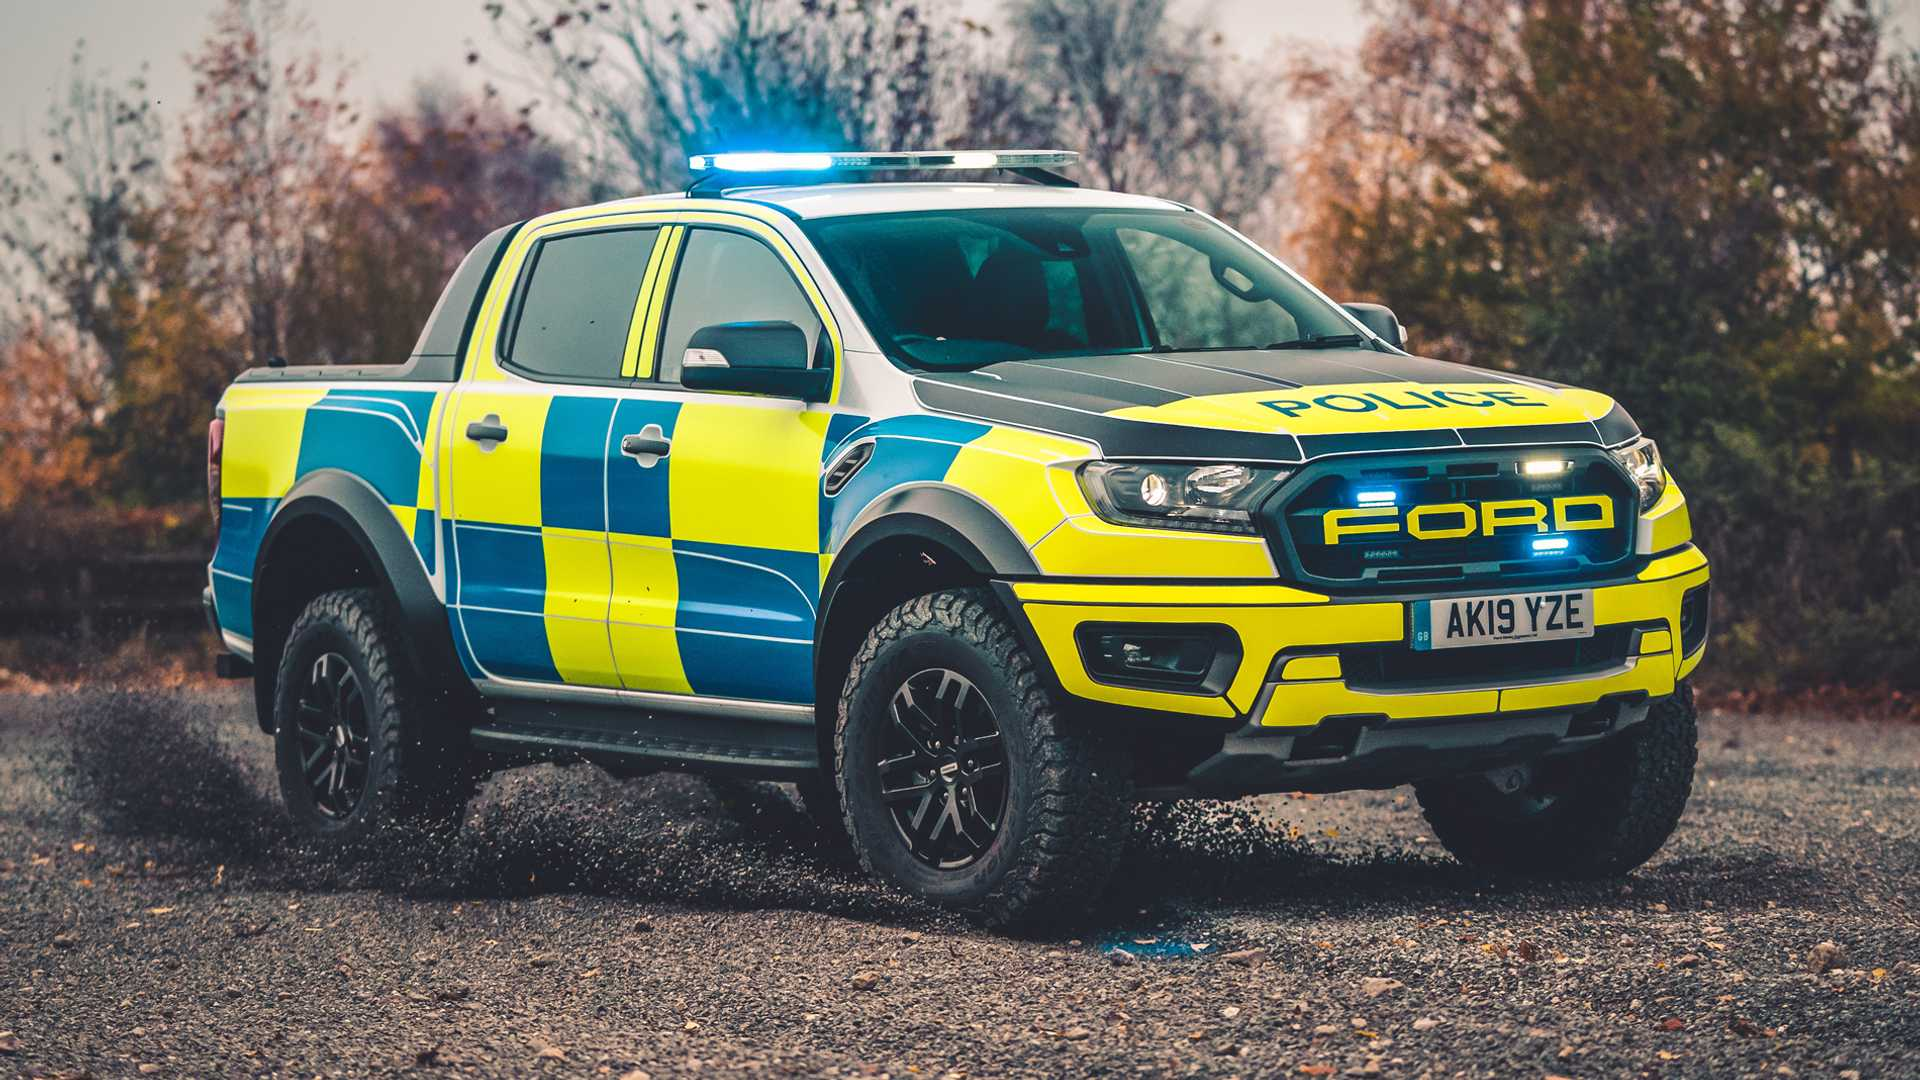 Ford-Focus-ST-and-Ranger-Raptor-UK-police-cars-14